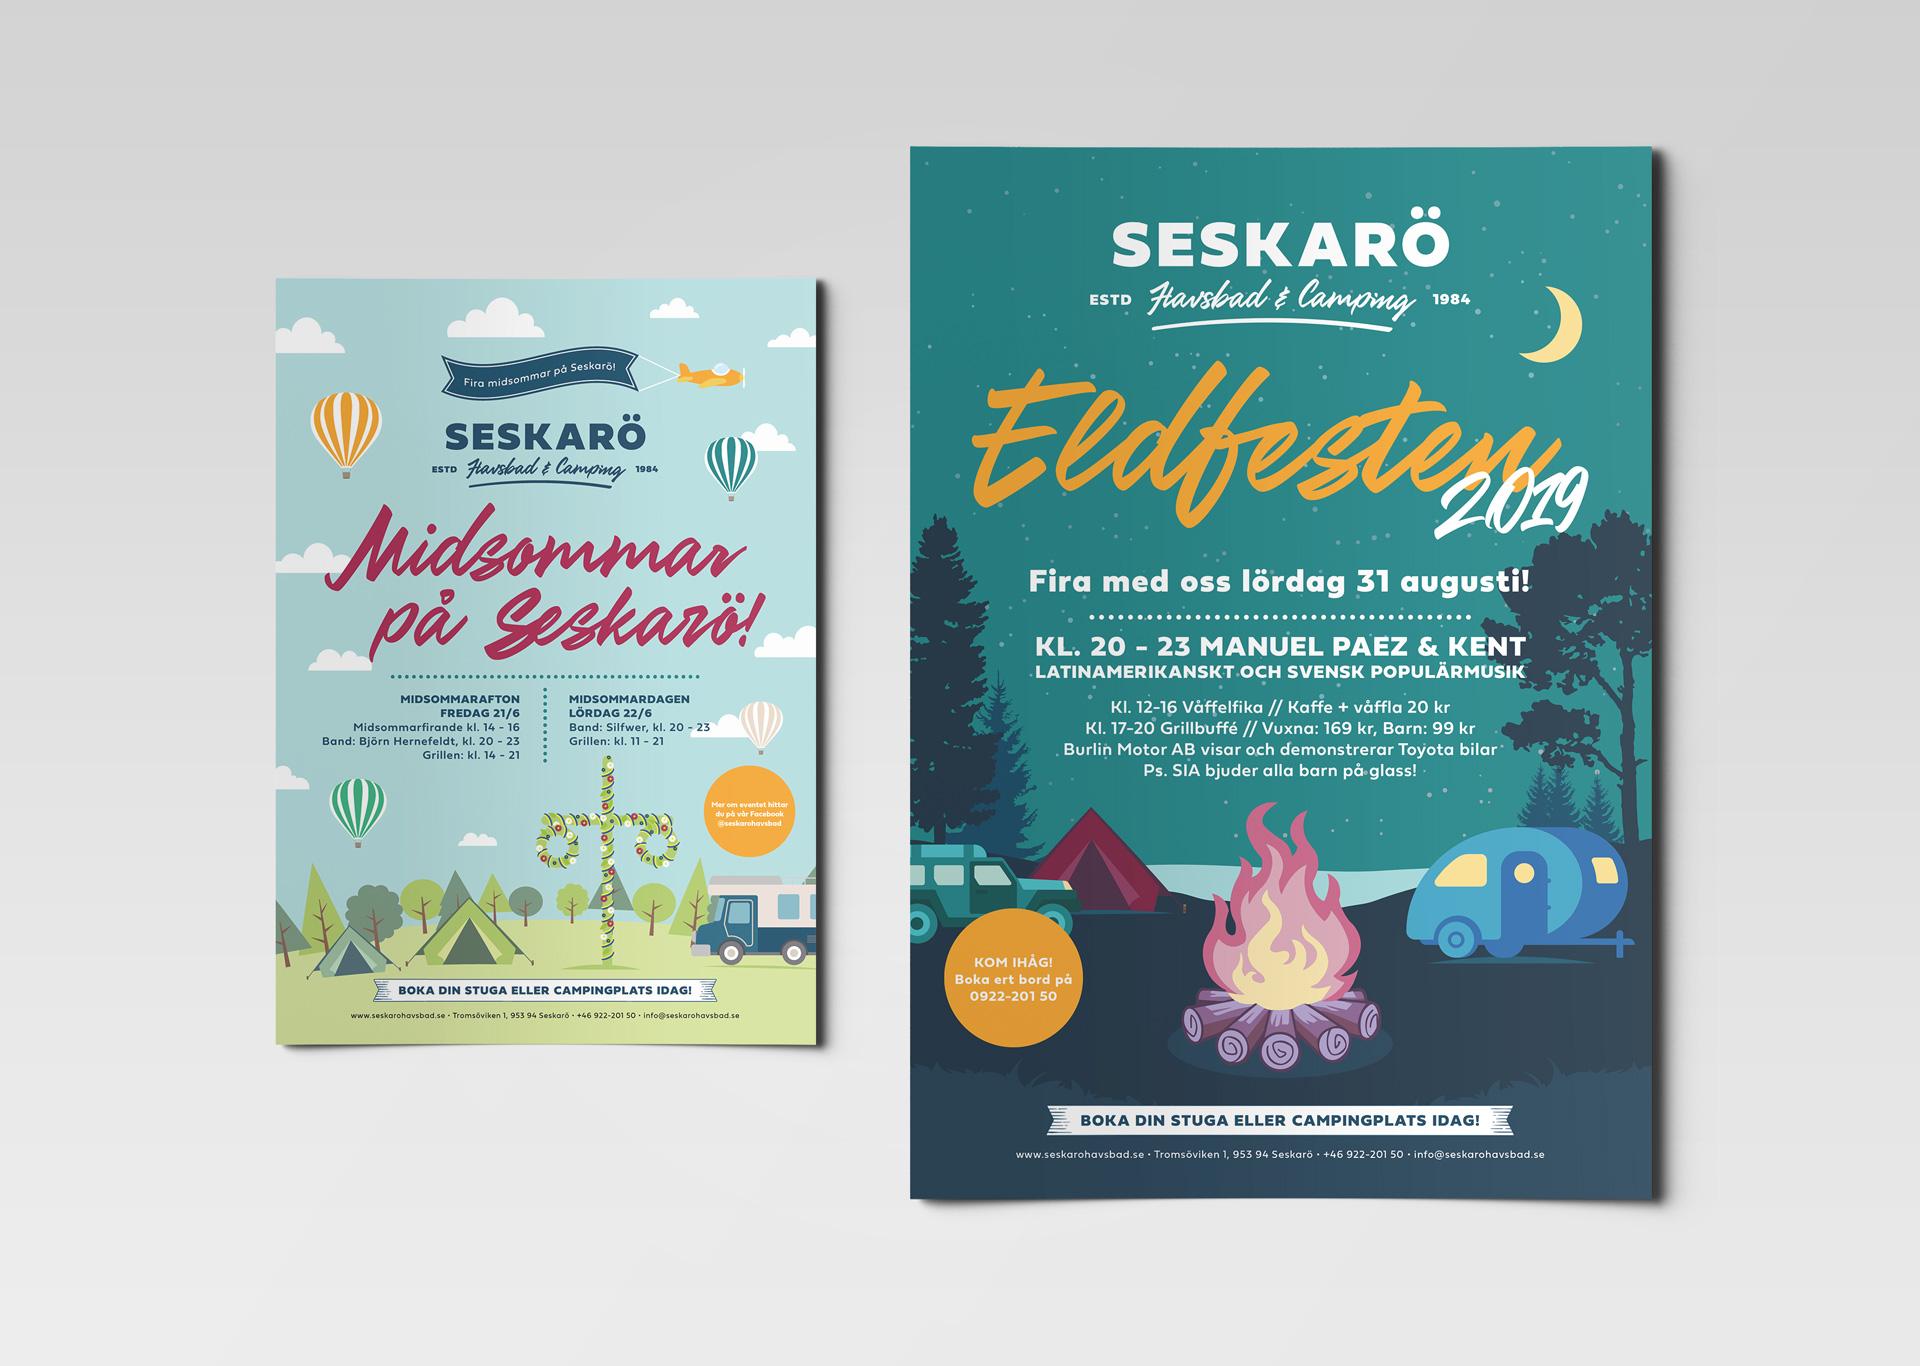 seskaro-poster-mockup.jpg